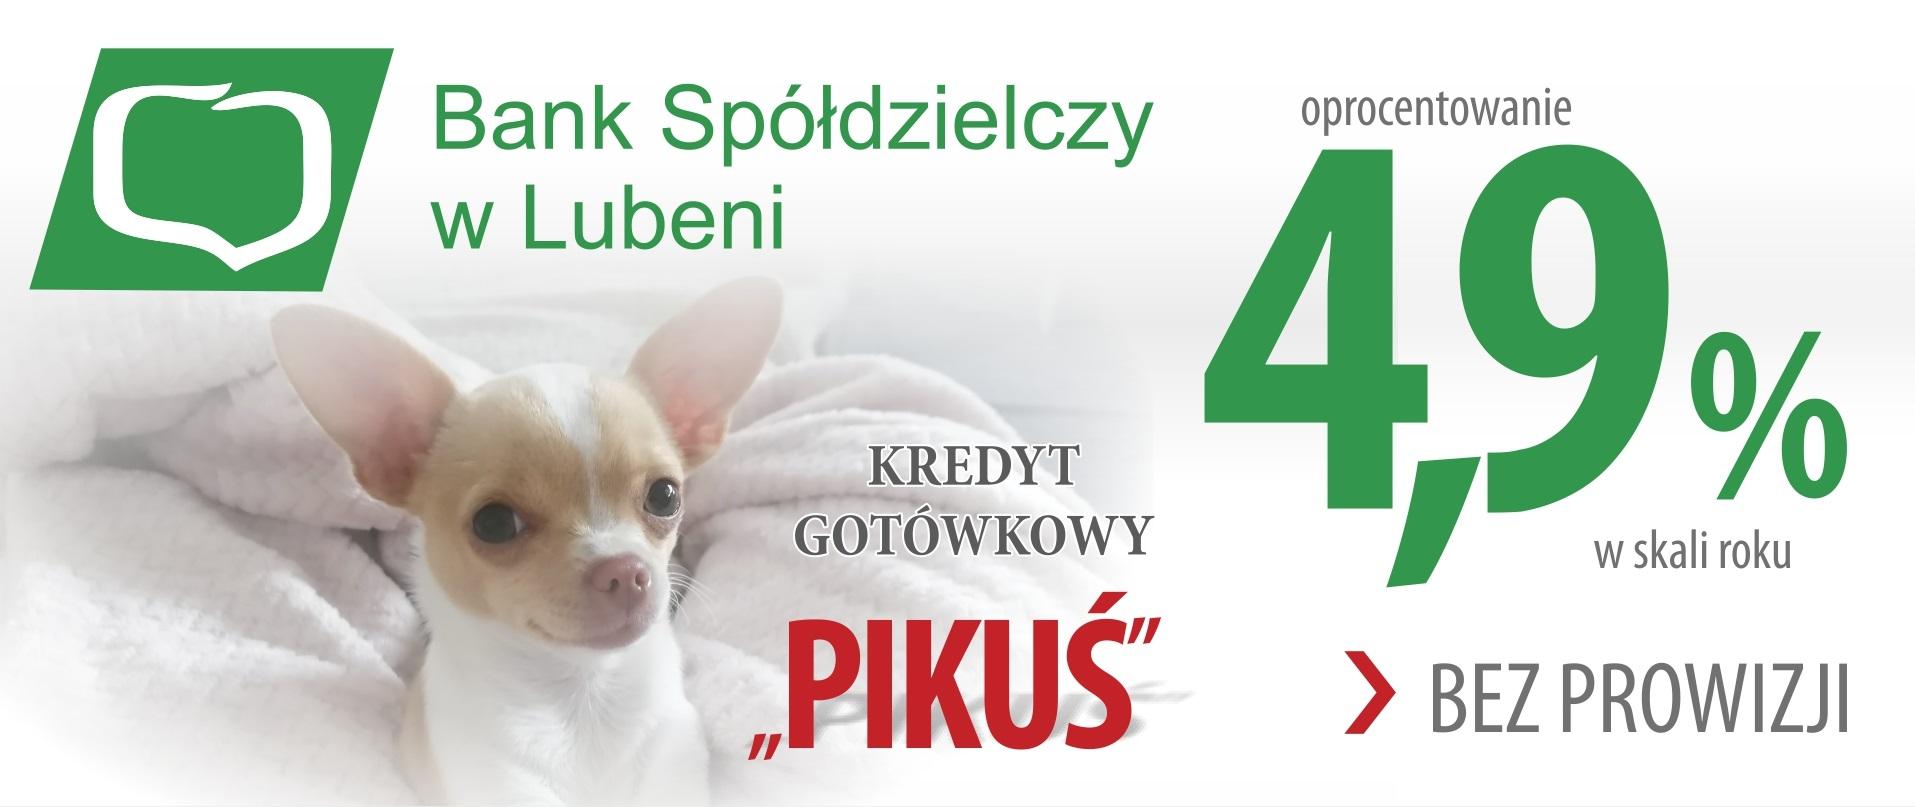 BS_Lubenia_Pikus.jpg